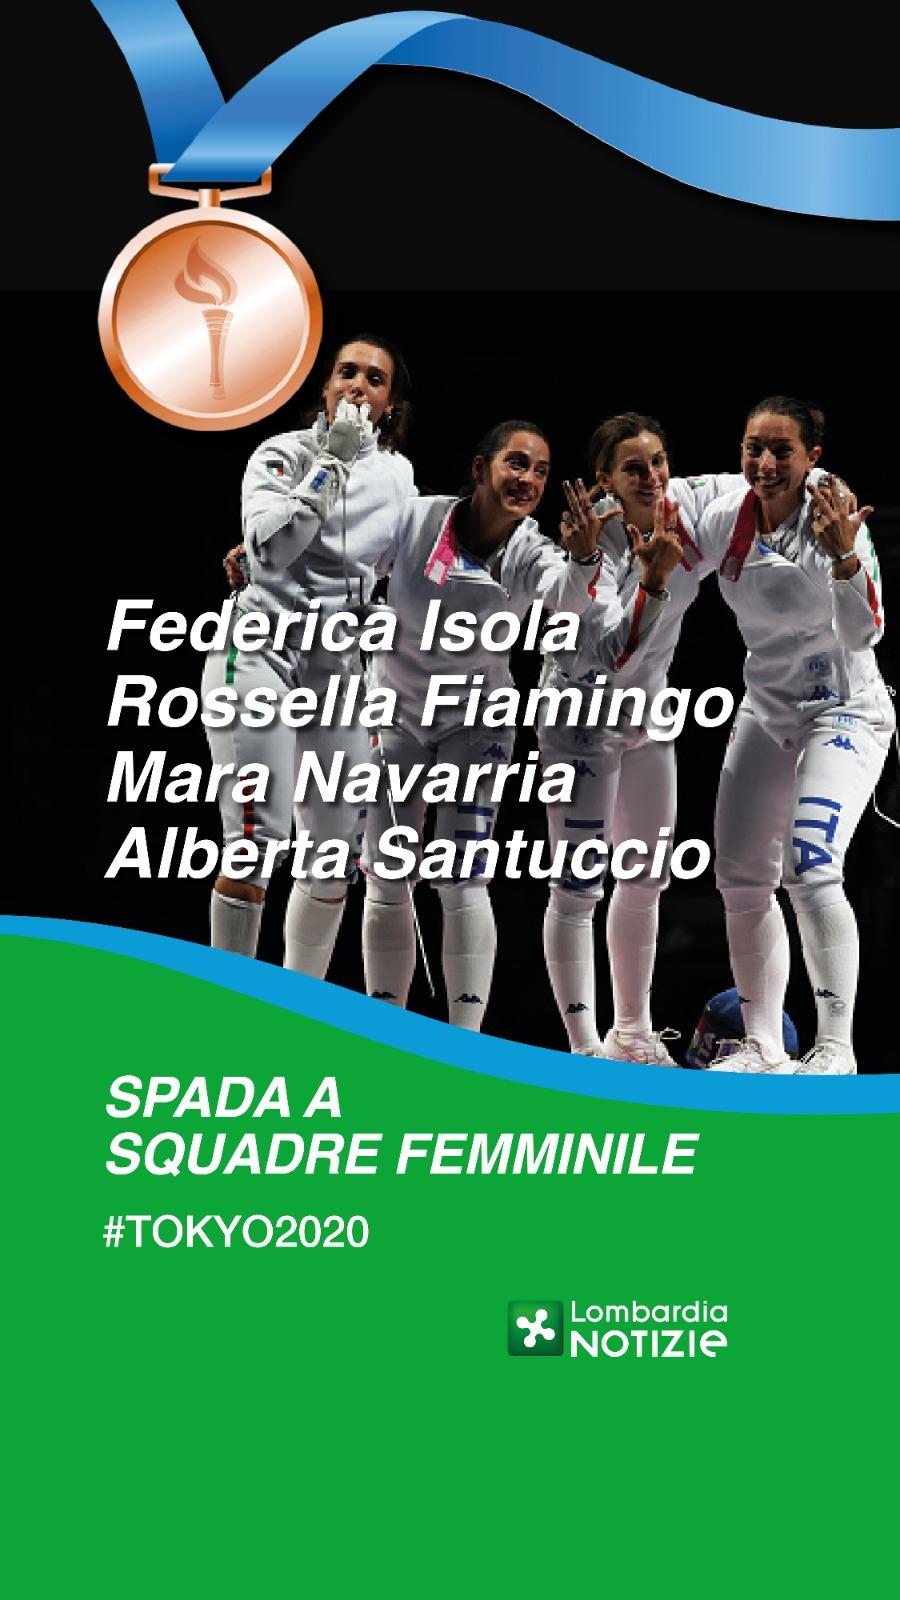 Tokyo 2020: Bronzo spada a squadre femminile